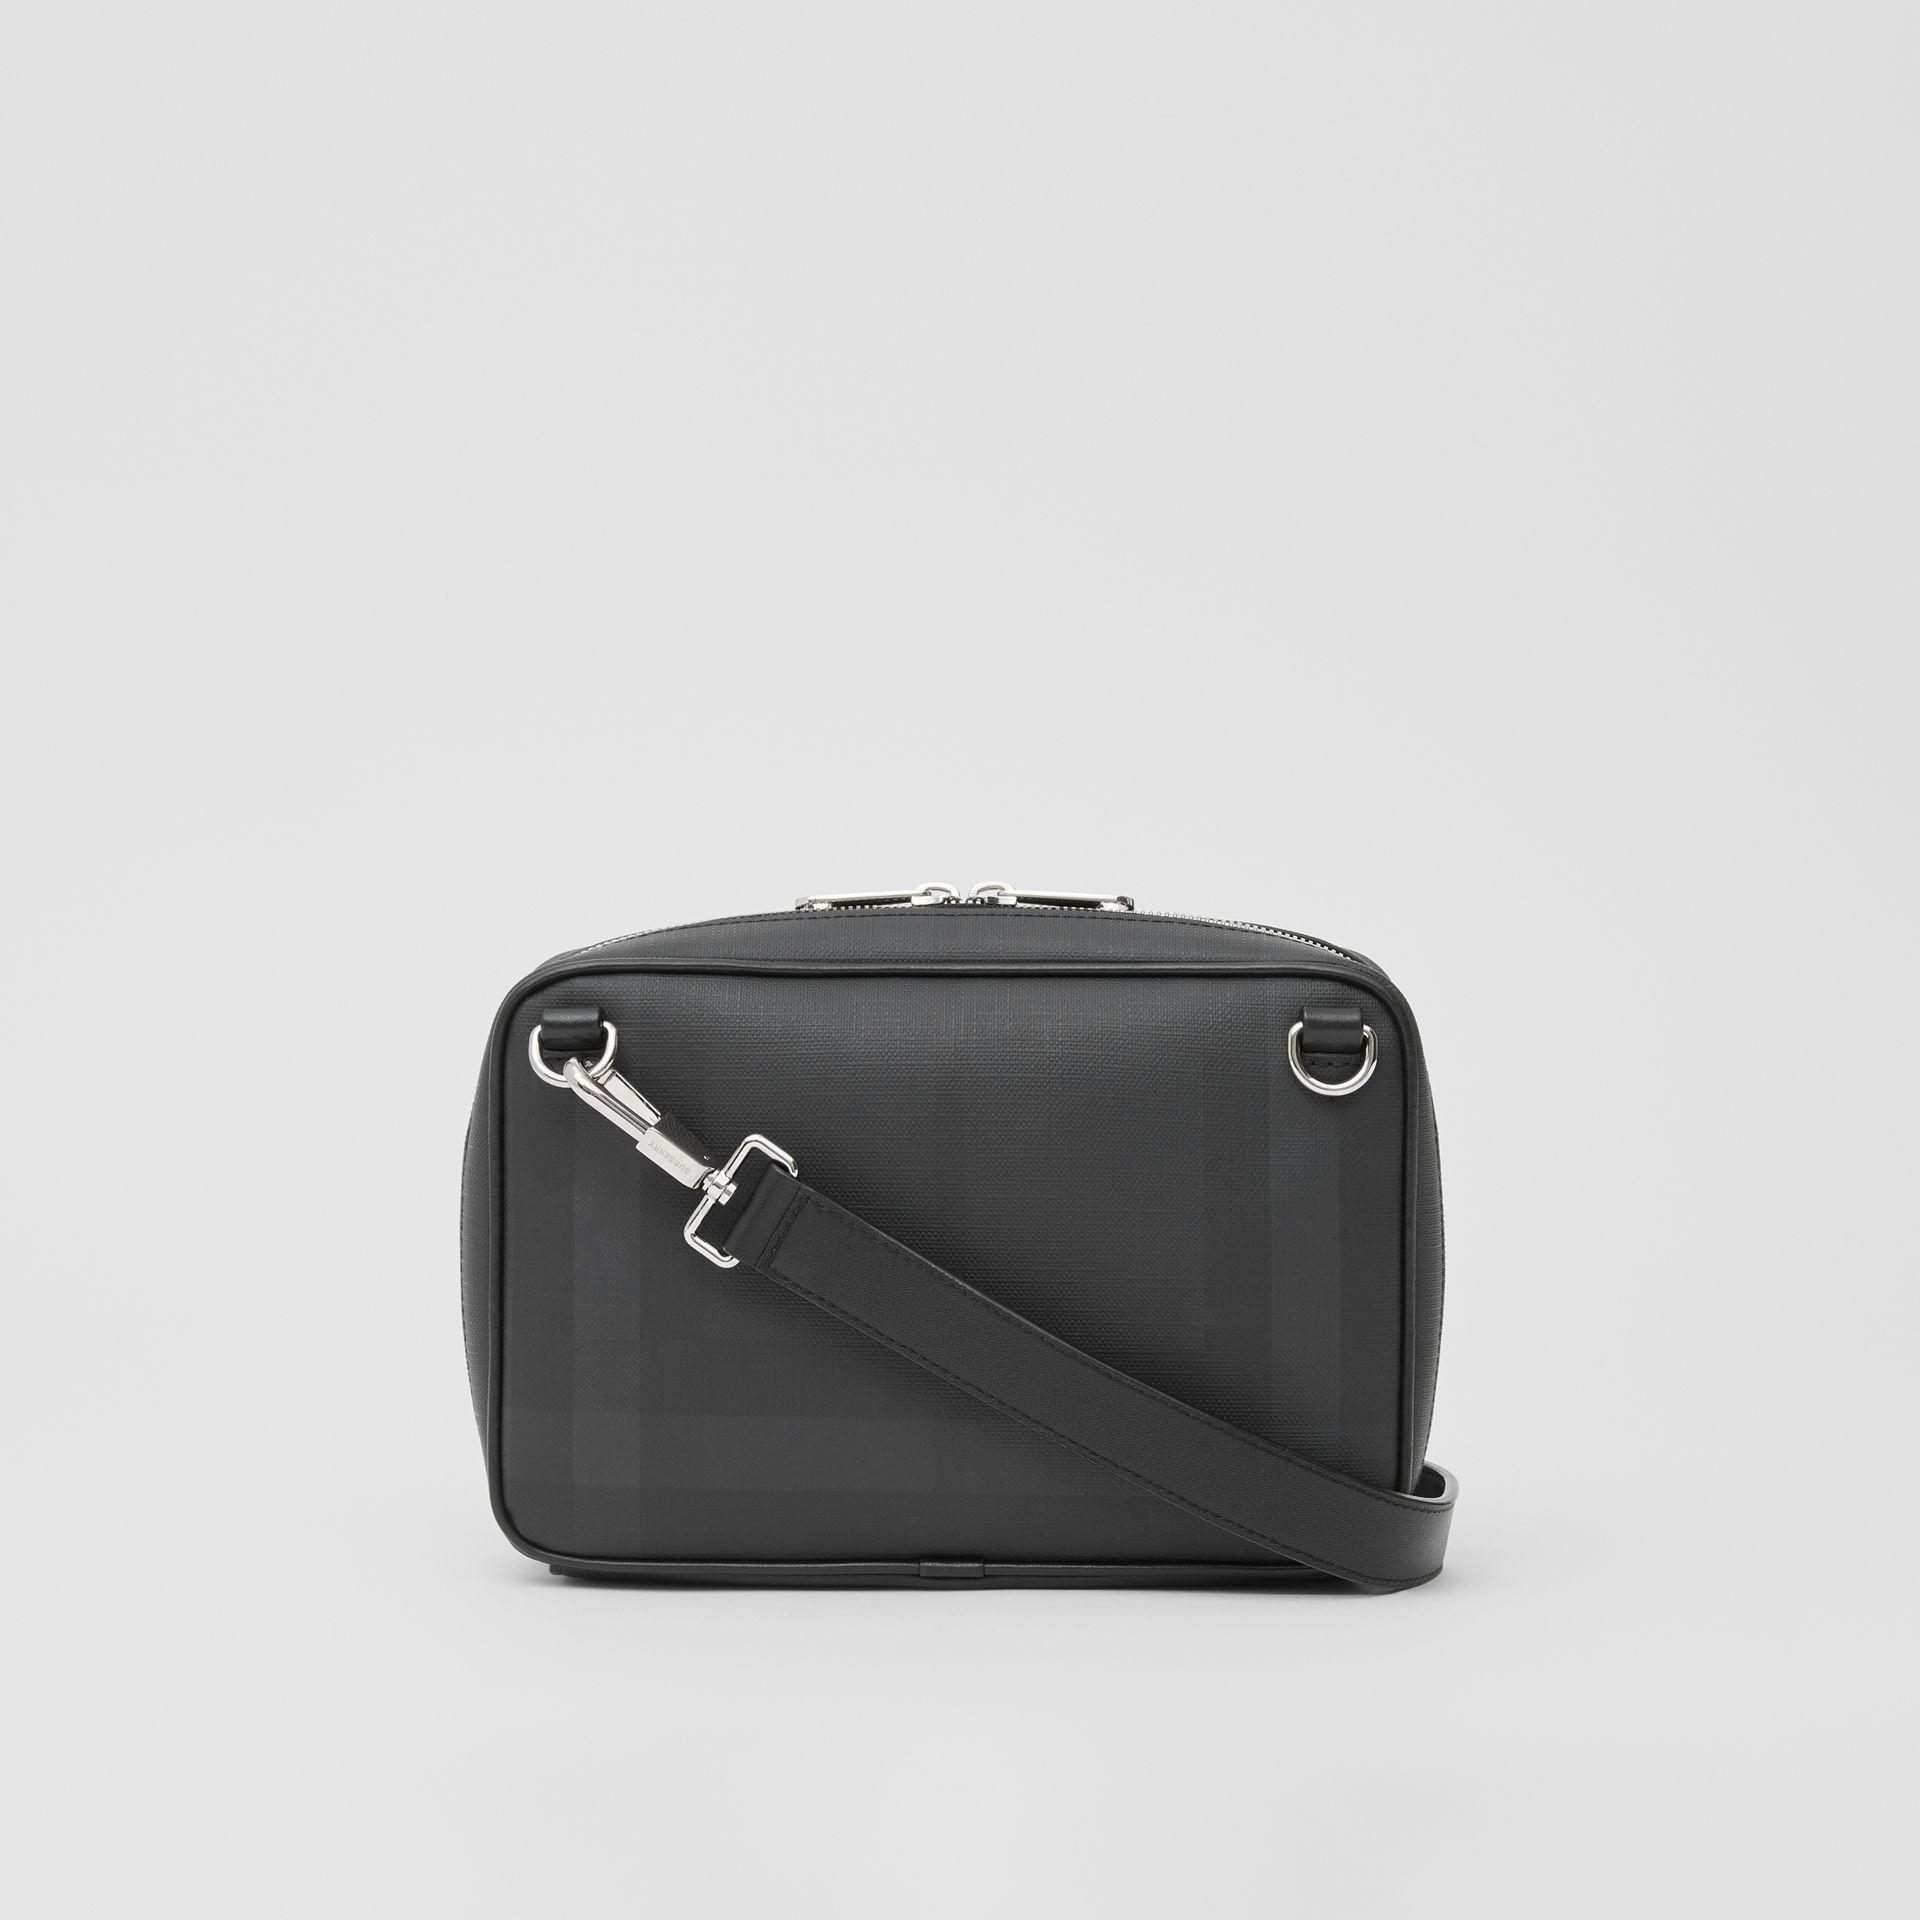 Logo Graphic London Check Crossbody Bag in Dark Charcoal - Men | Burberry United Kingdom - gallery image 7